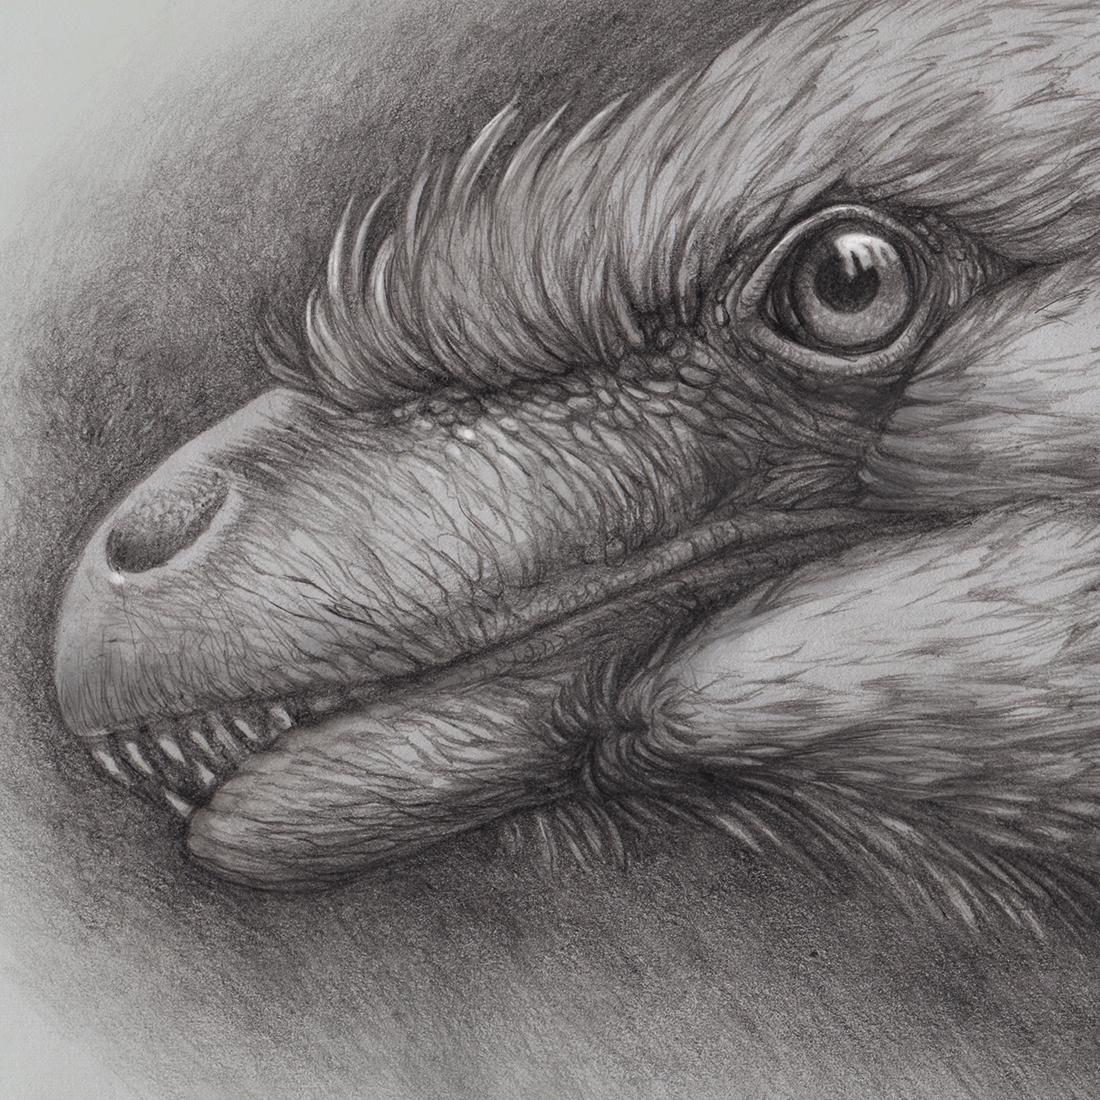 Utahraptor portrait